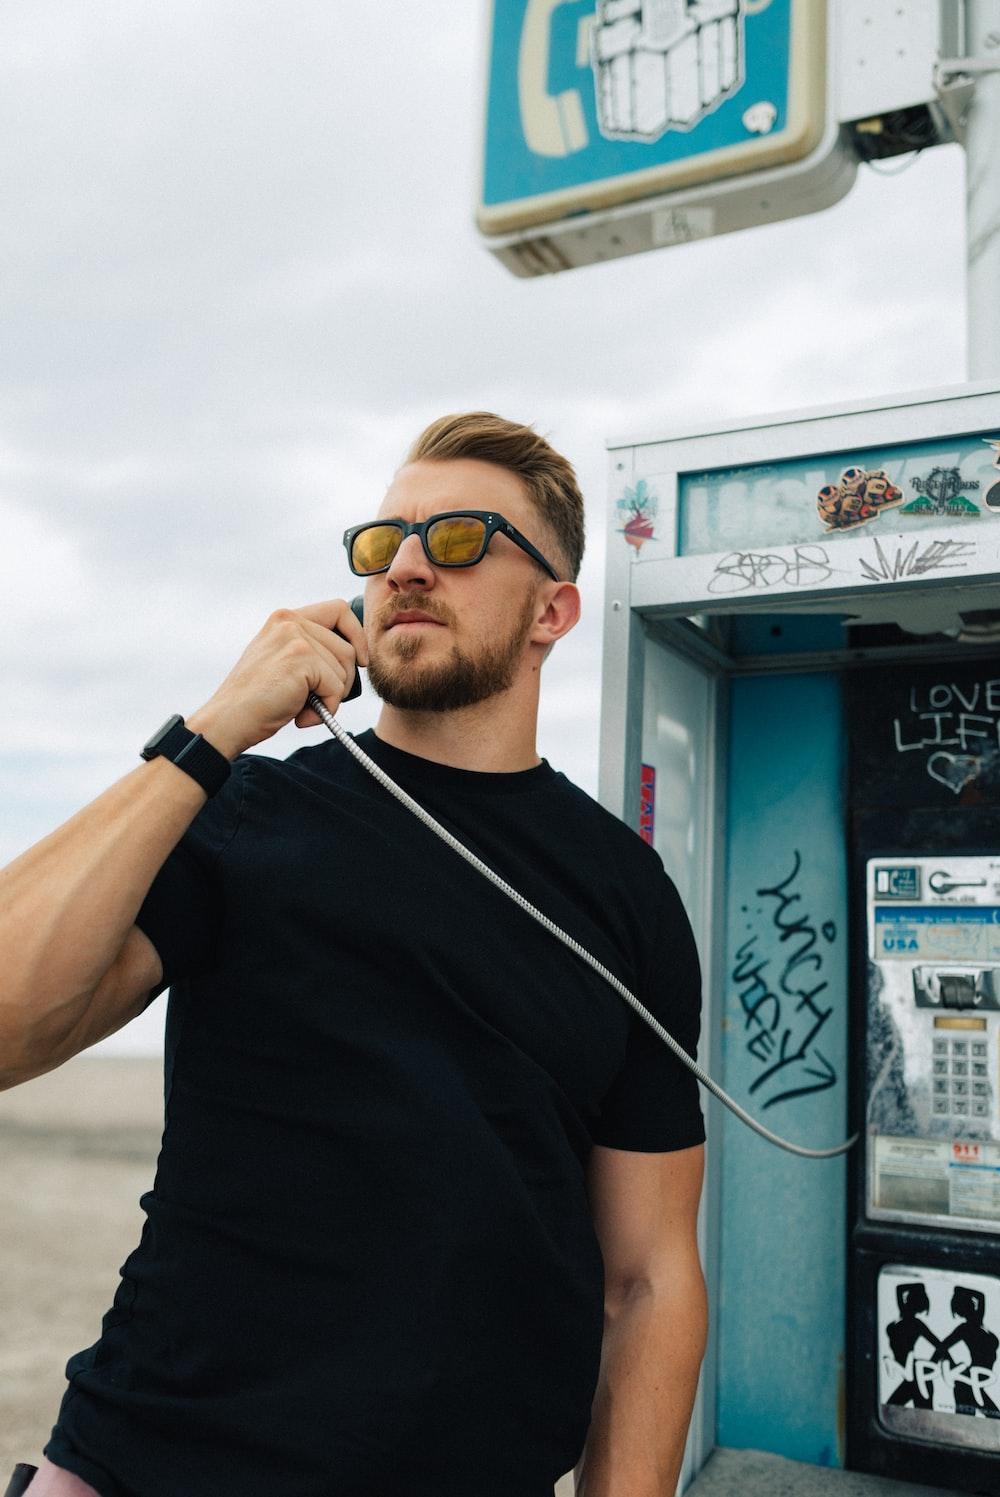 man in black crew neck t-shirt wearing sunglasses